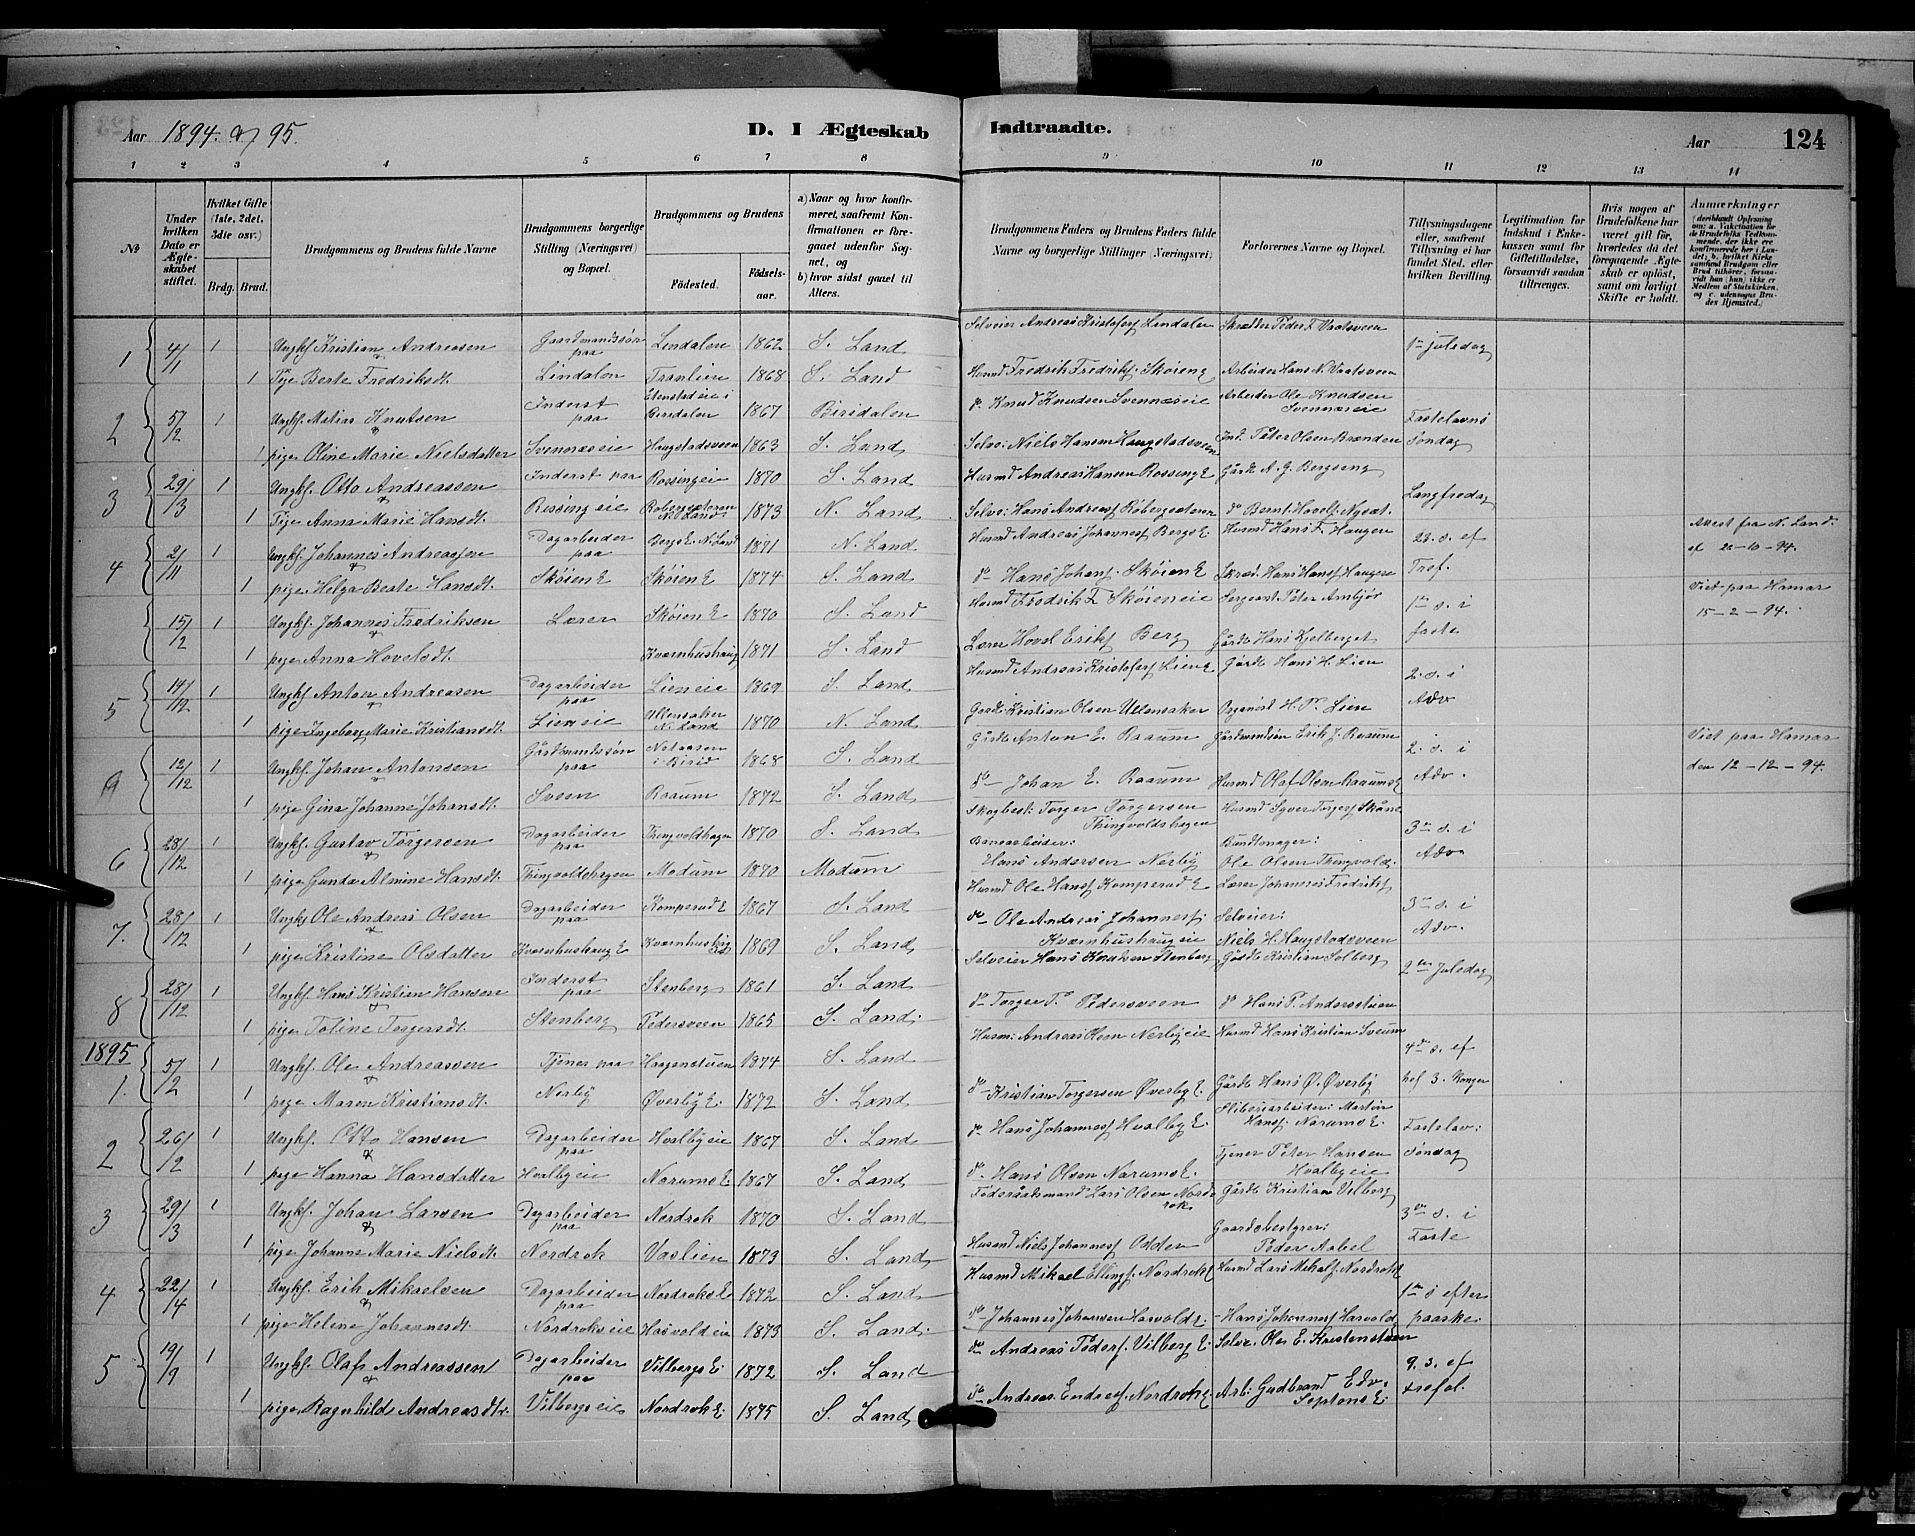 SAH, Søndre Land prestekontor, L/L0003: Klokkerbok nr. 3, 1884-1902, s. 124